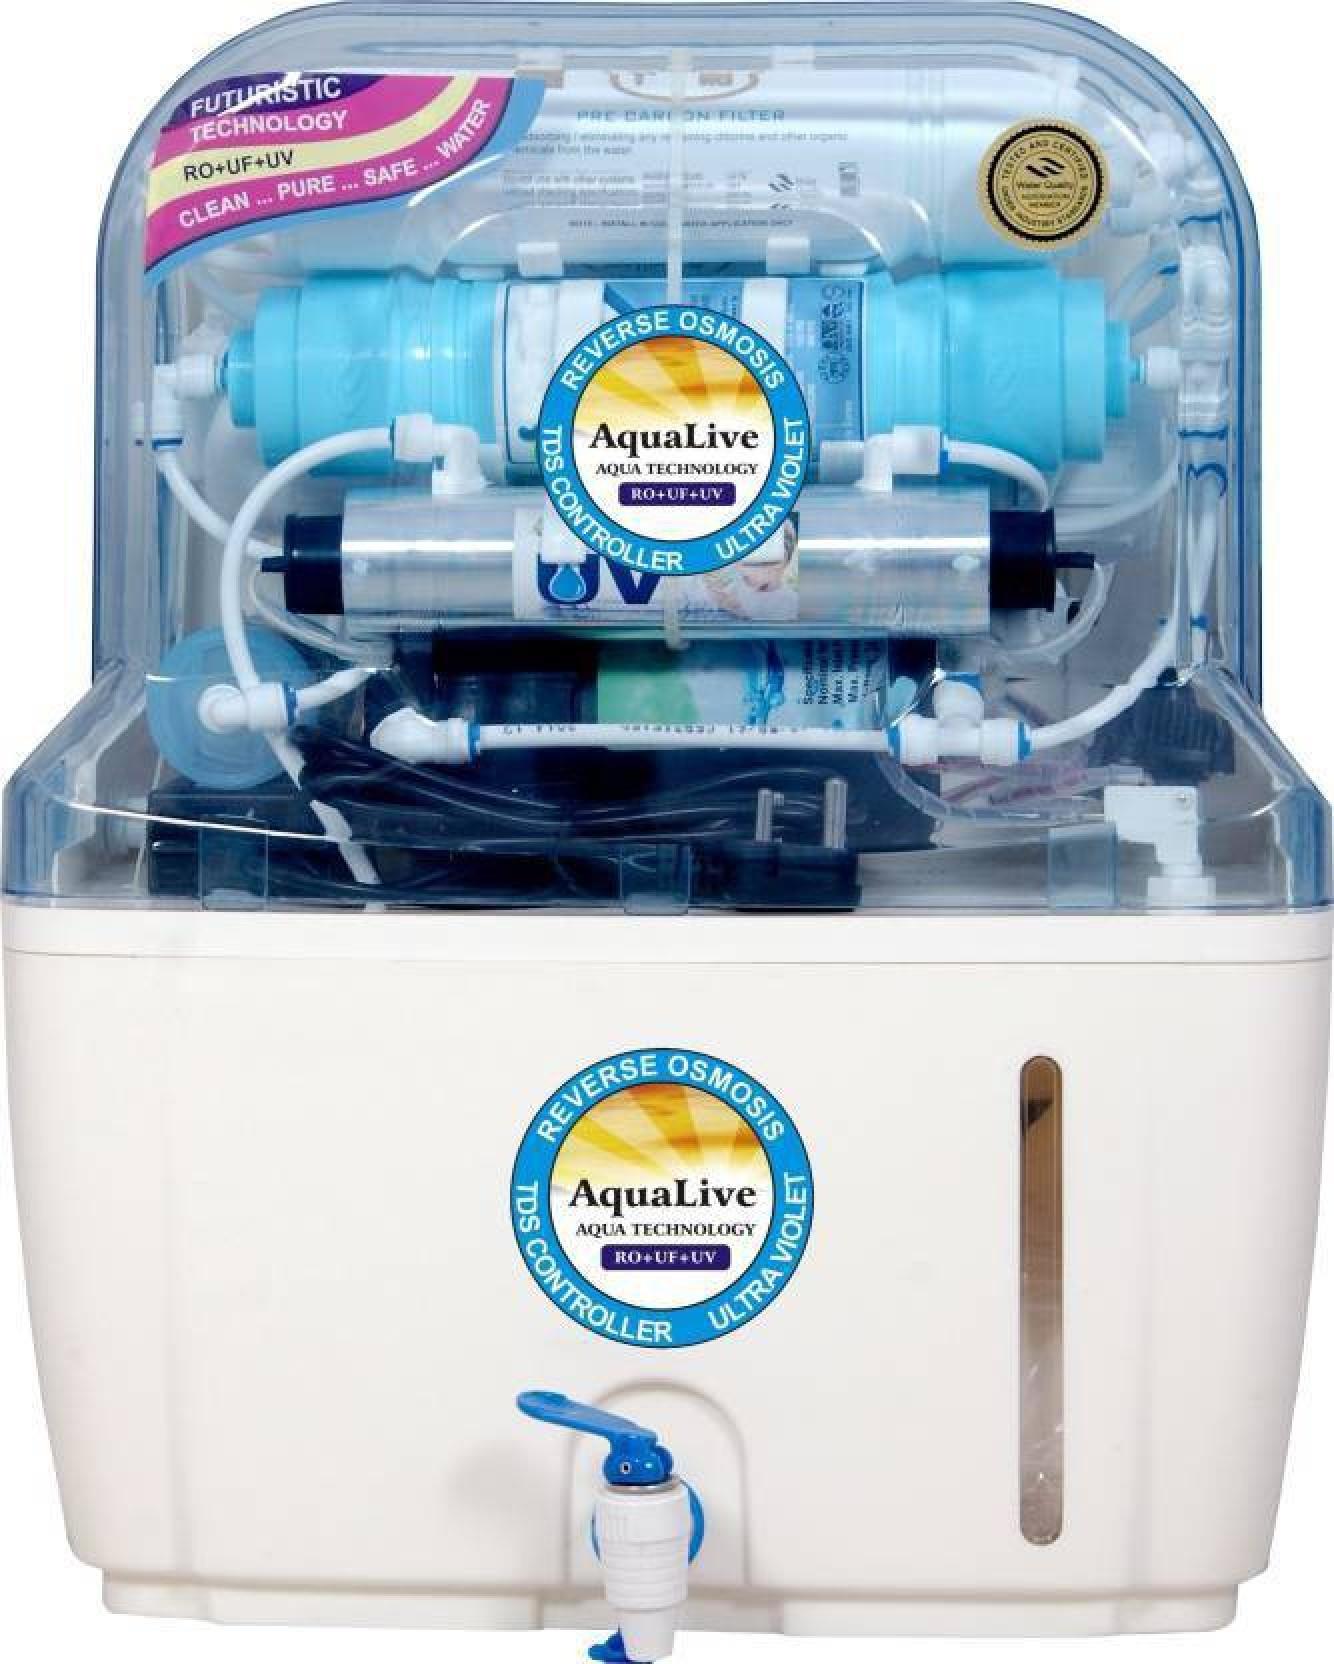 AQUALIVE V Plus Swift Bio++ Alkaline 15 L RO + UV +UF Water